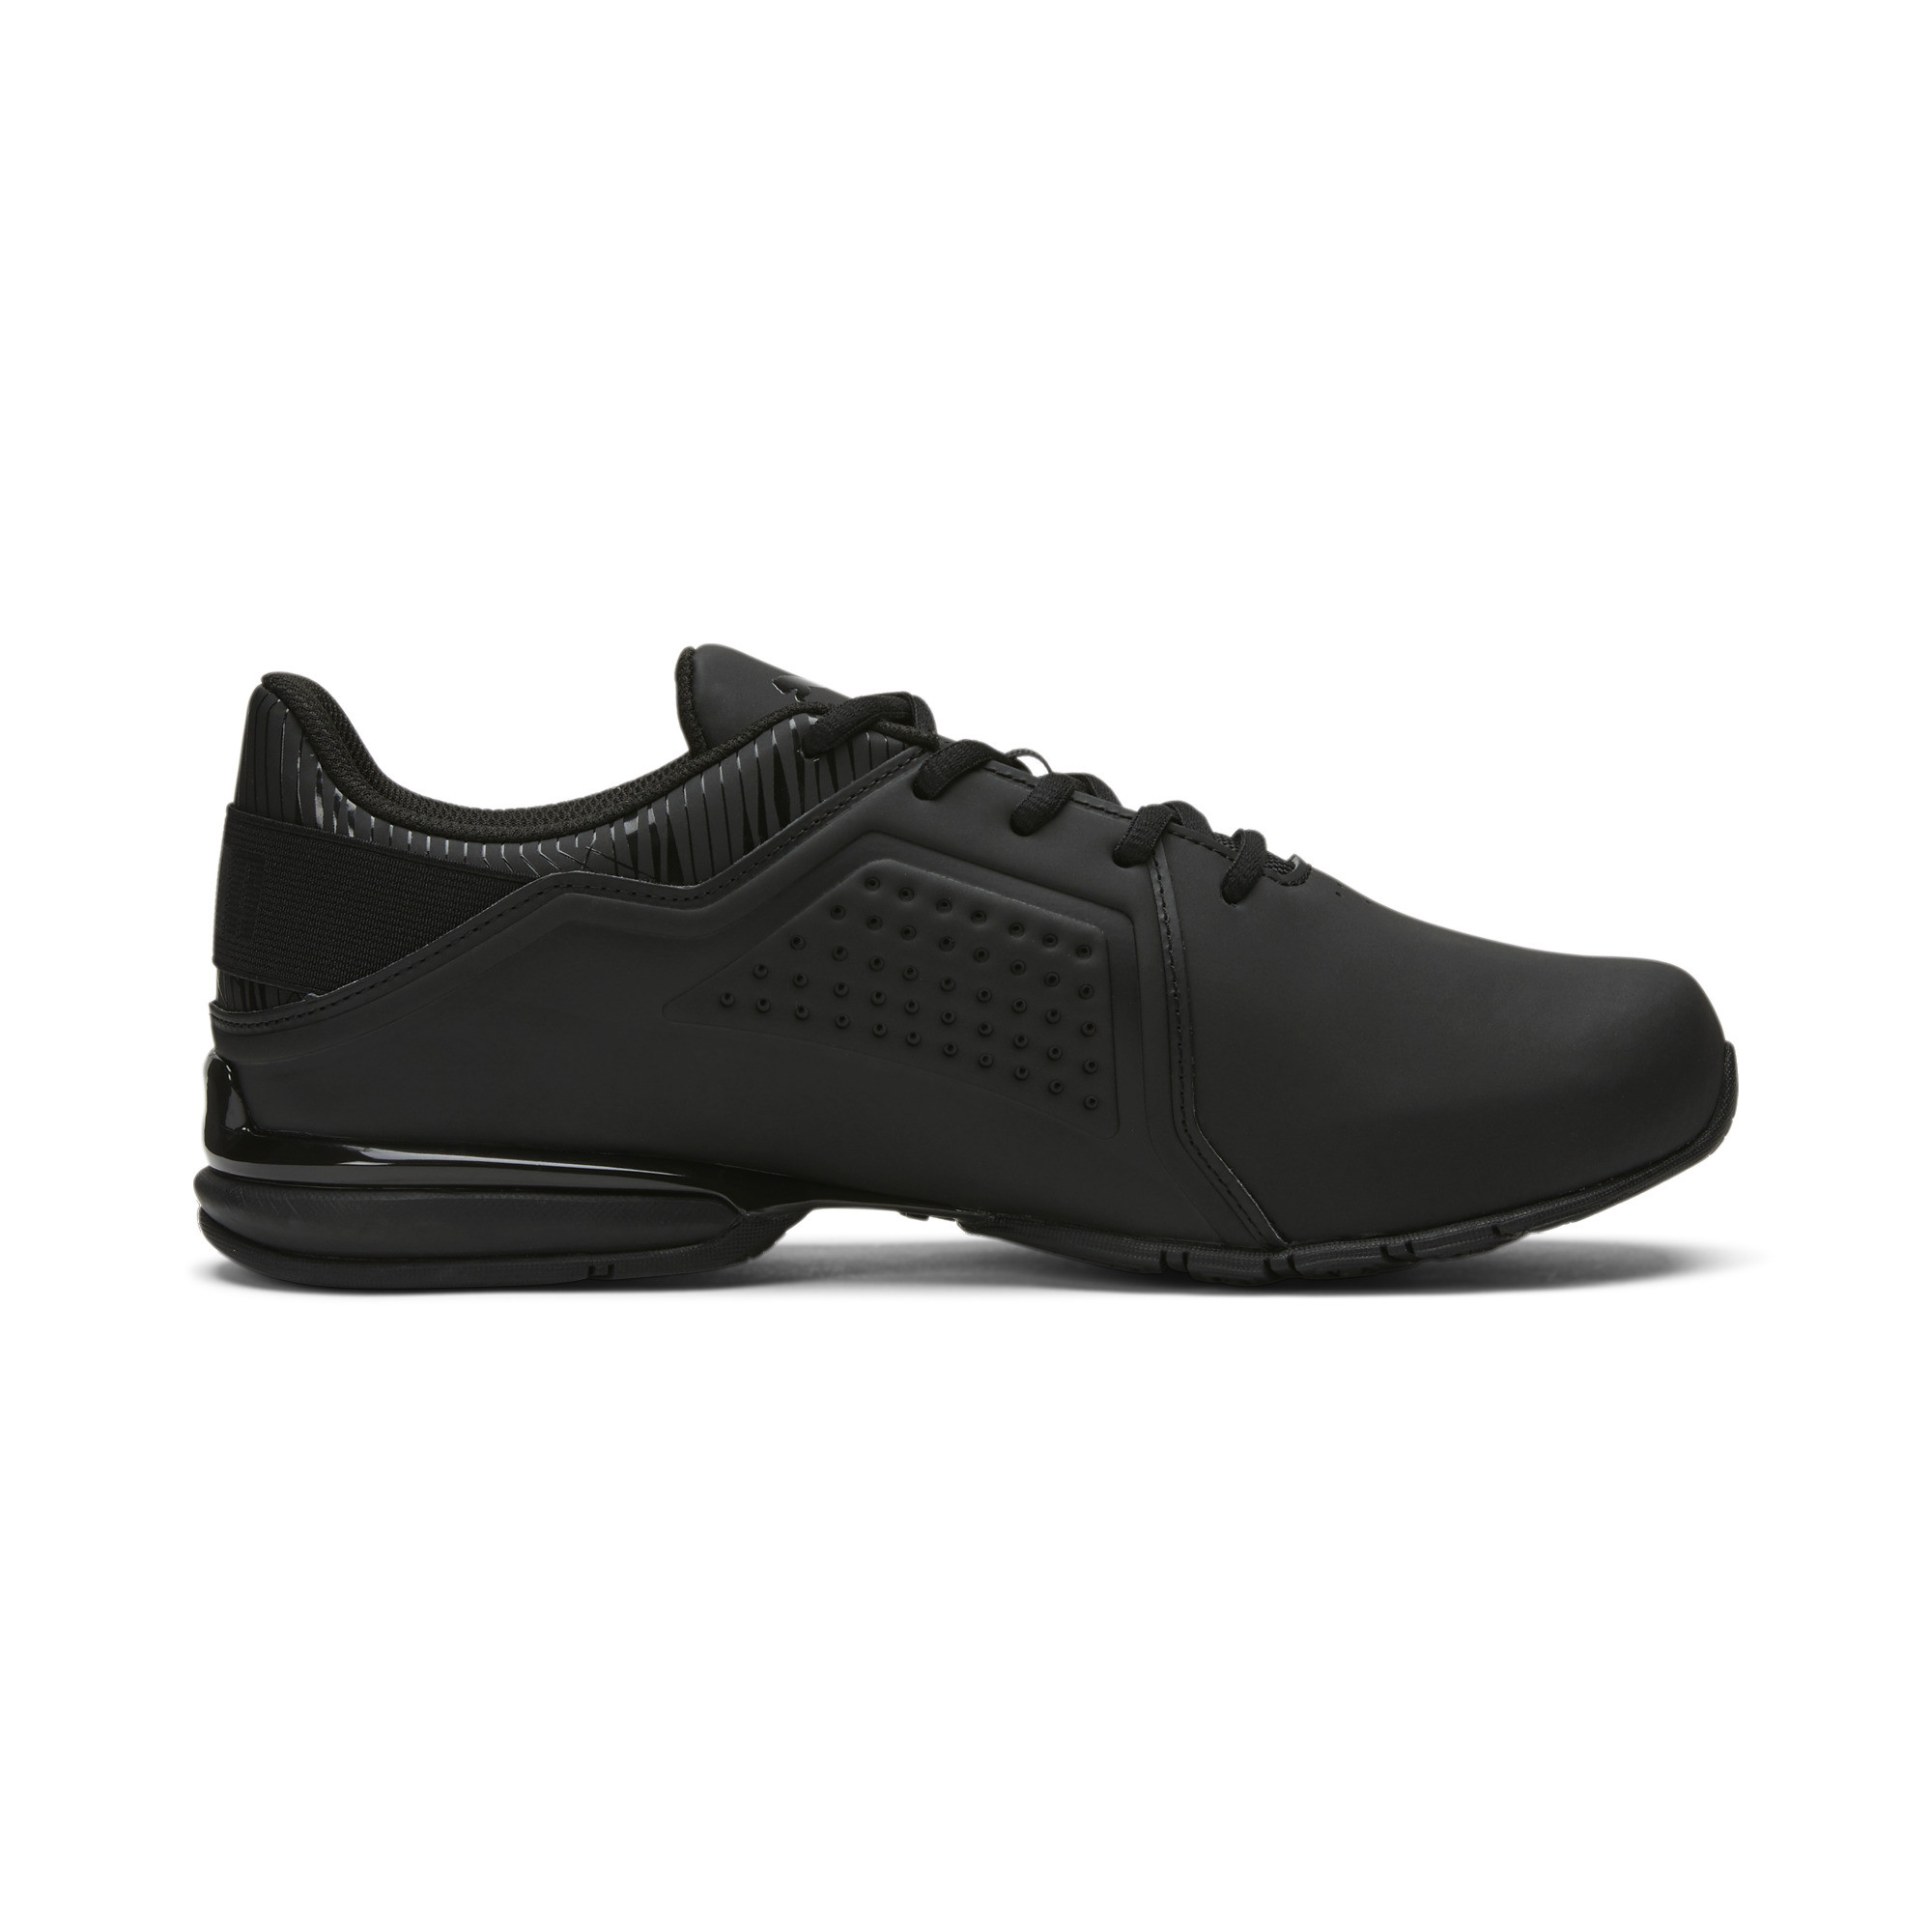 PUMA-Men-039-s-Viz-Runner-Graphic-Sneakers thumbnail 29